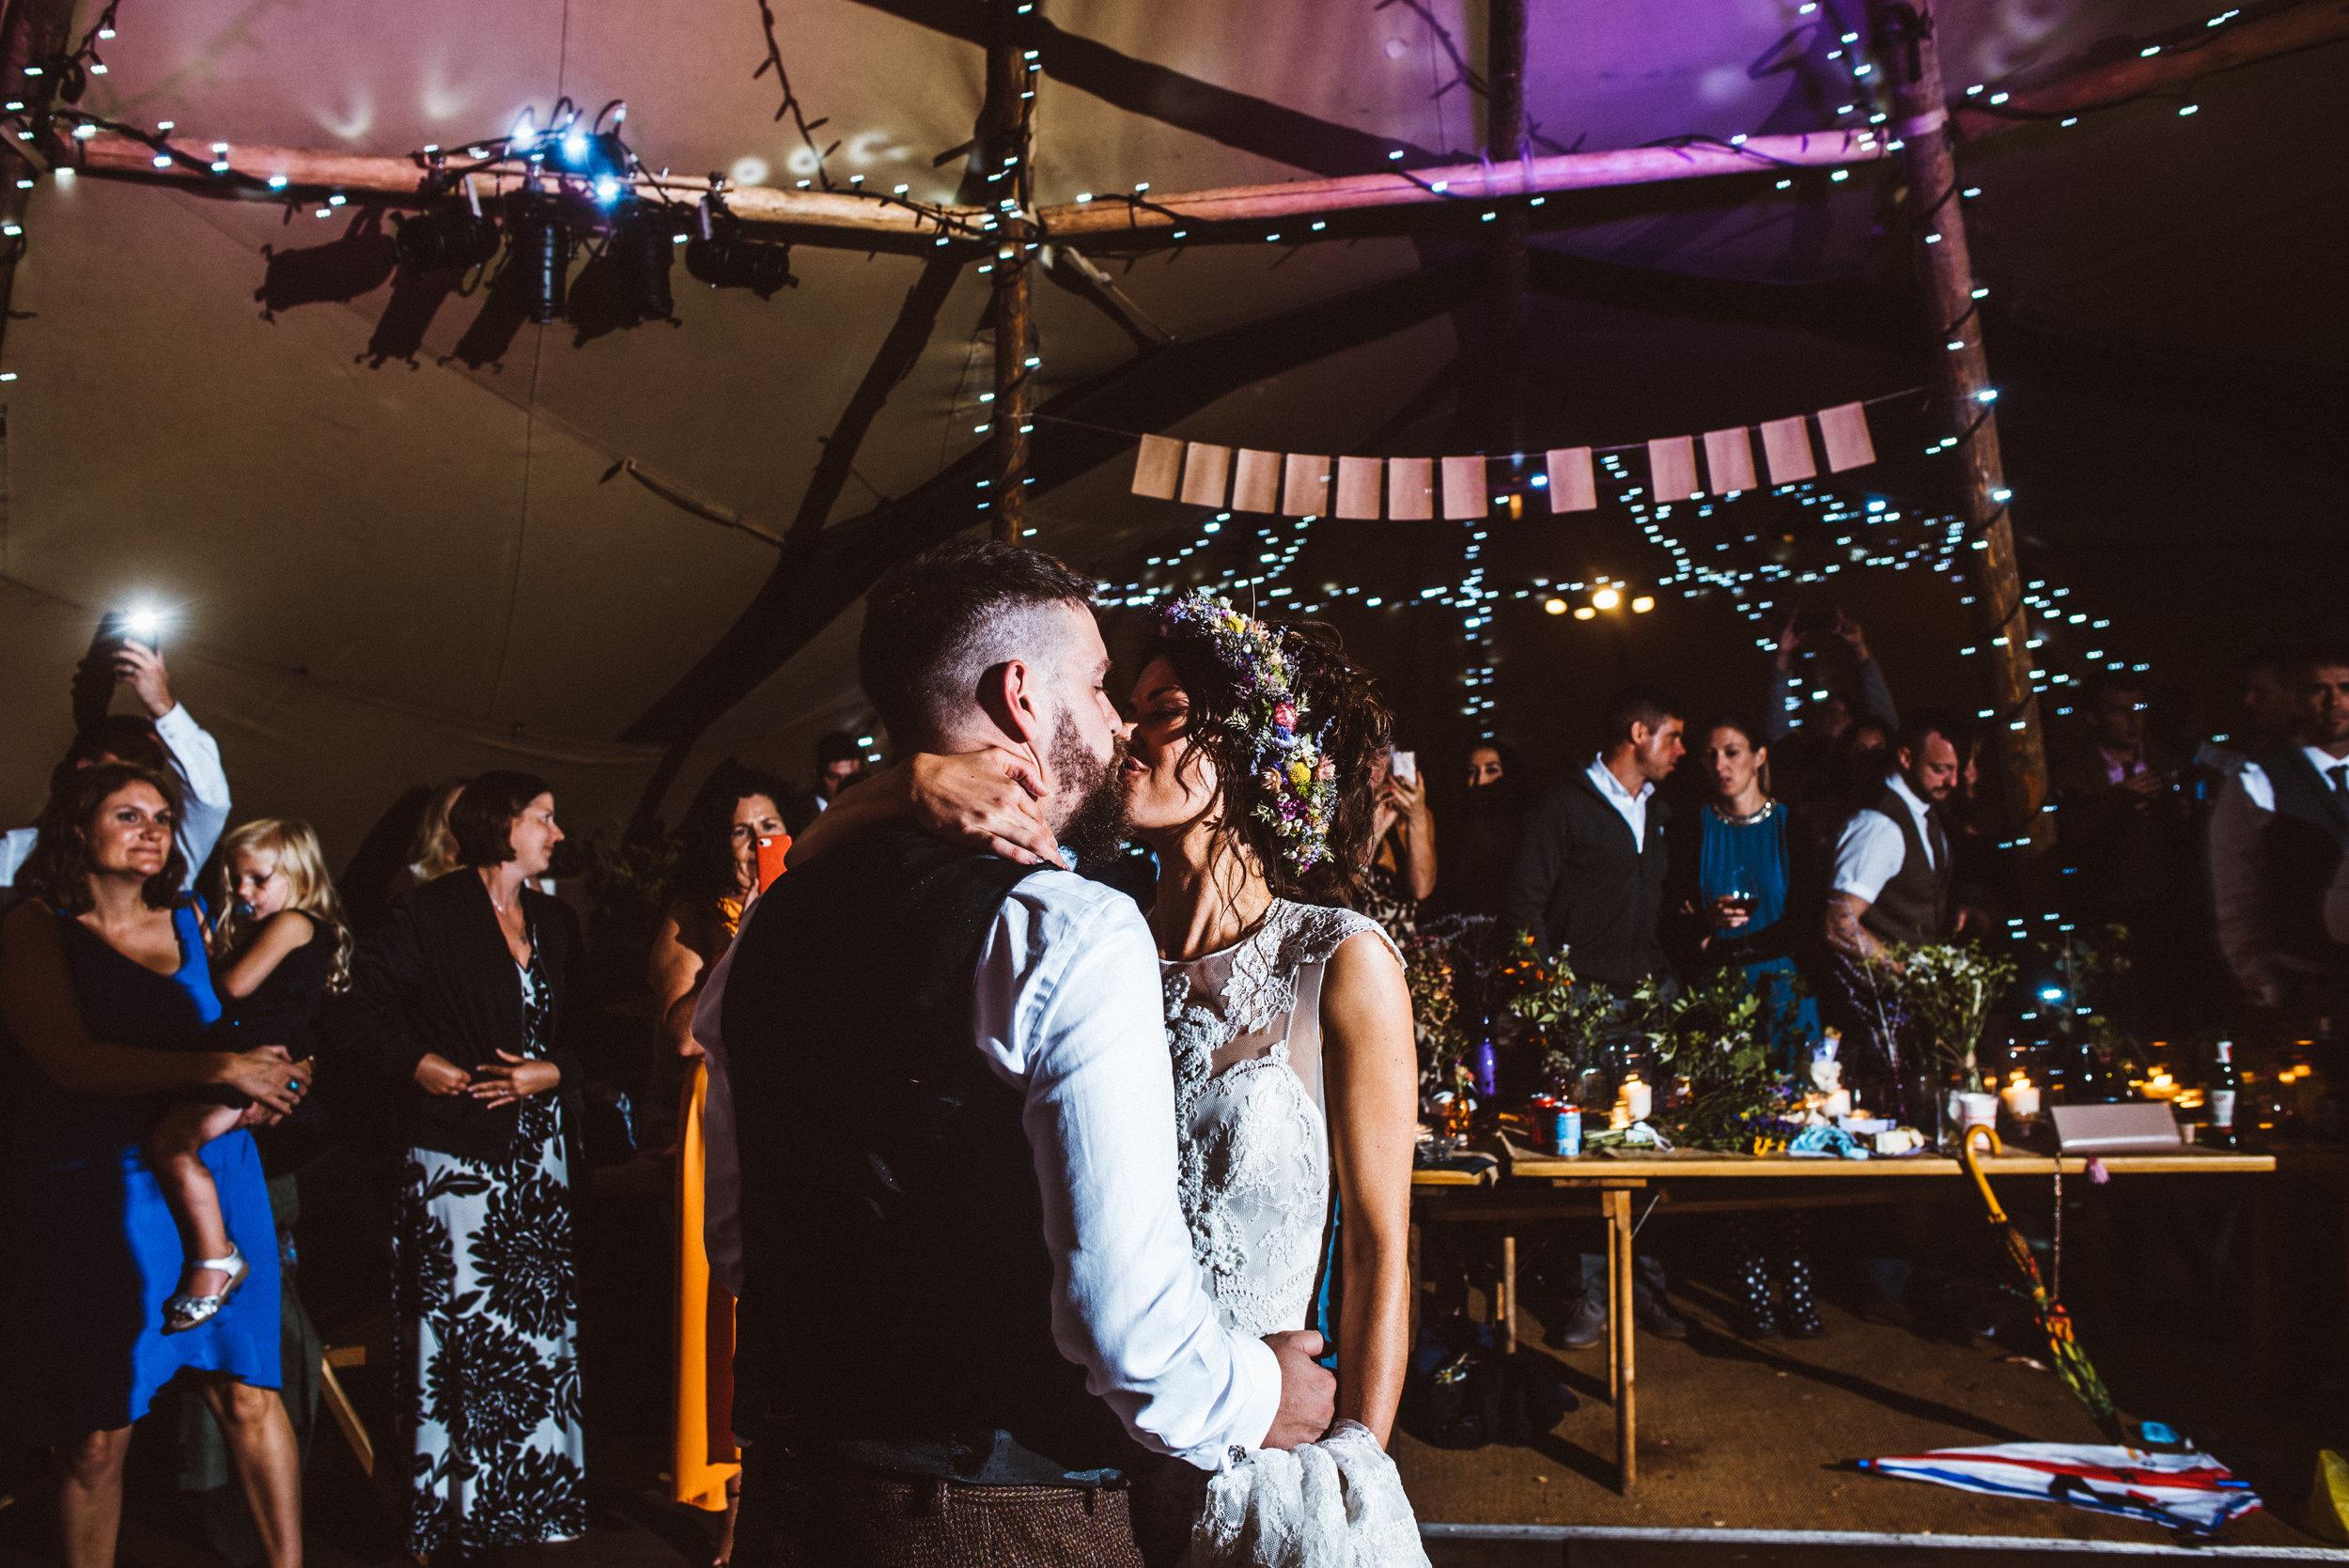 pengenna-manor-wedding-photographer-87.jpg